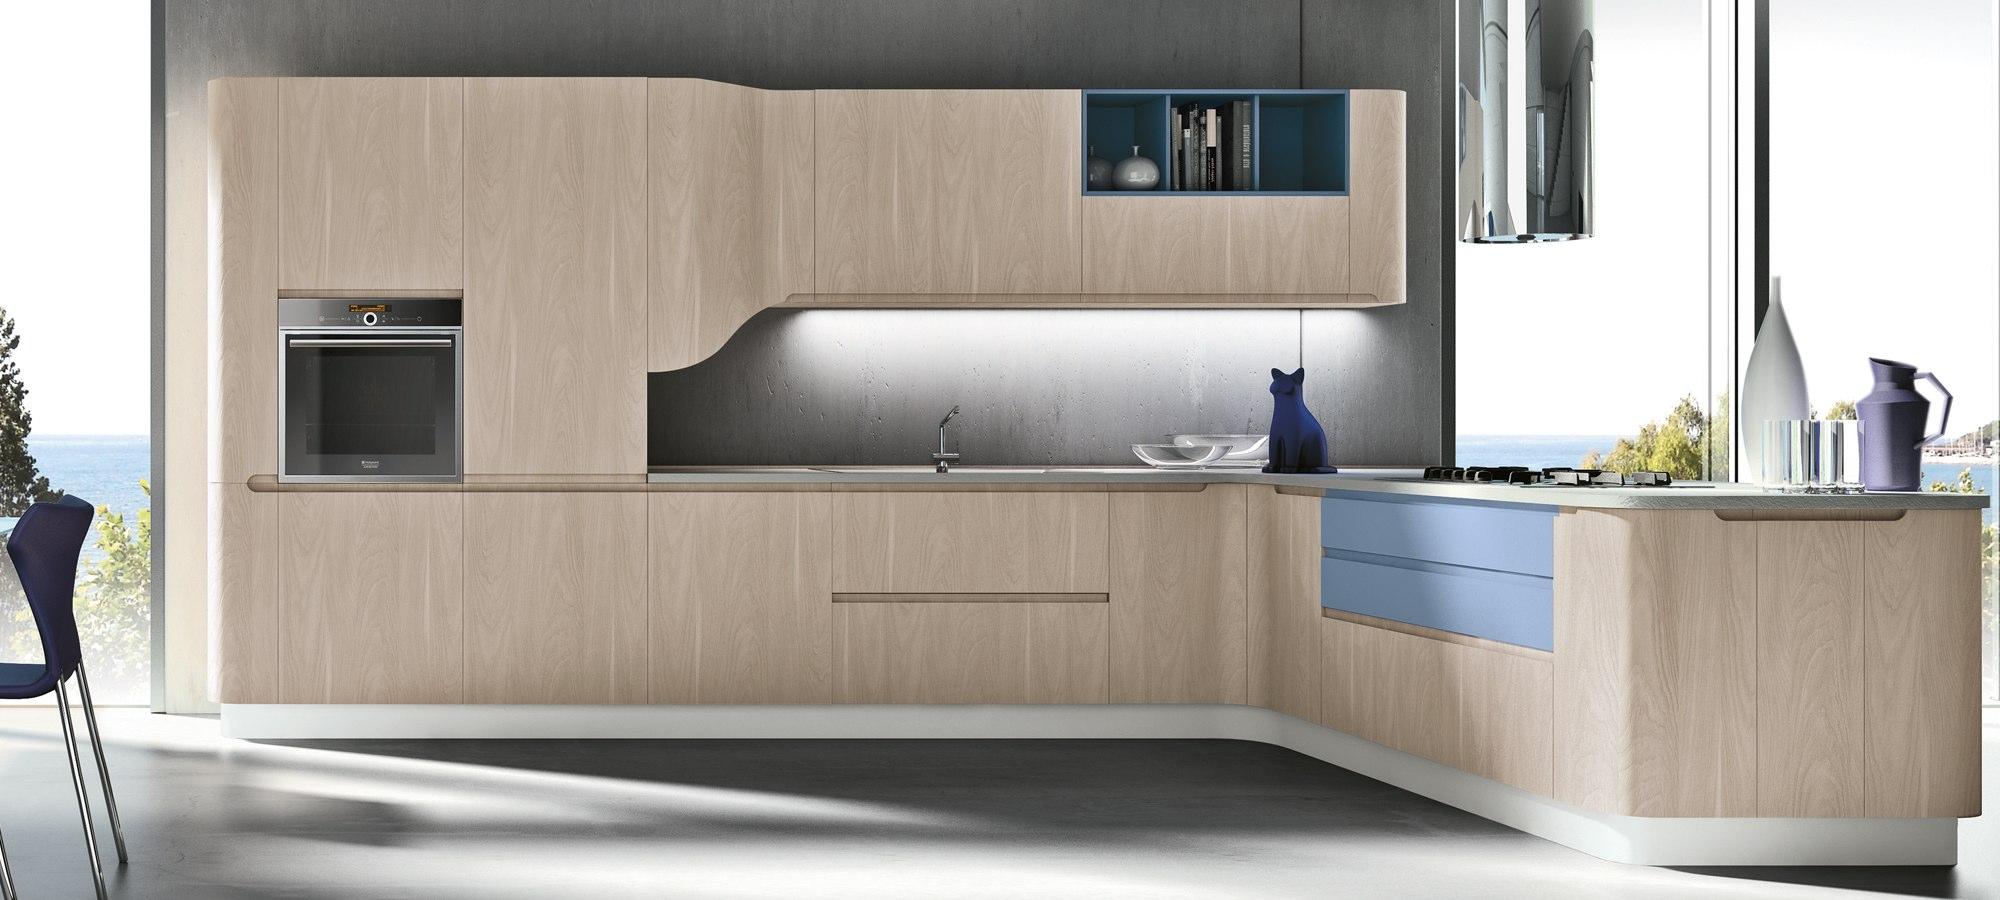 Bring - Adda Möbel - die beste Möbel aus Italien